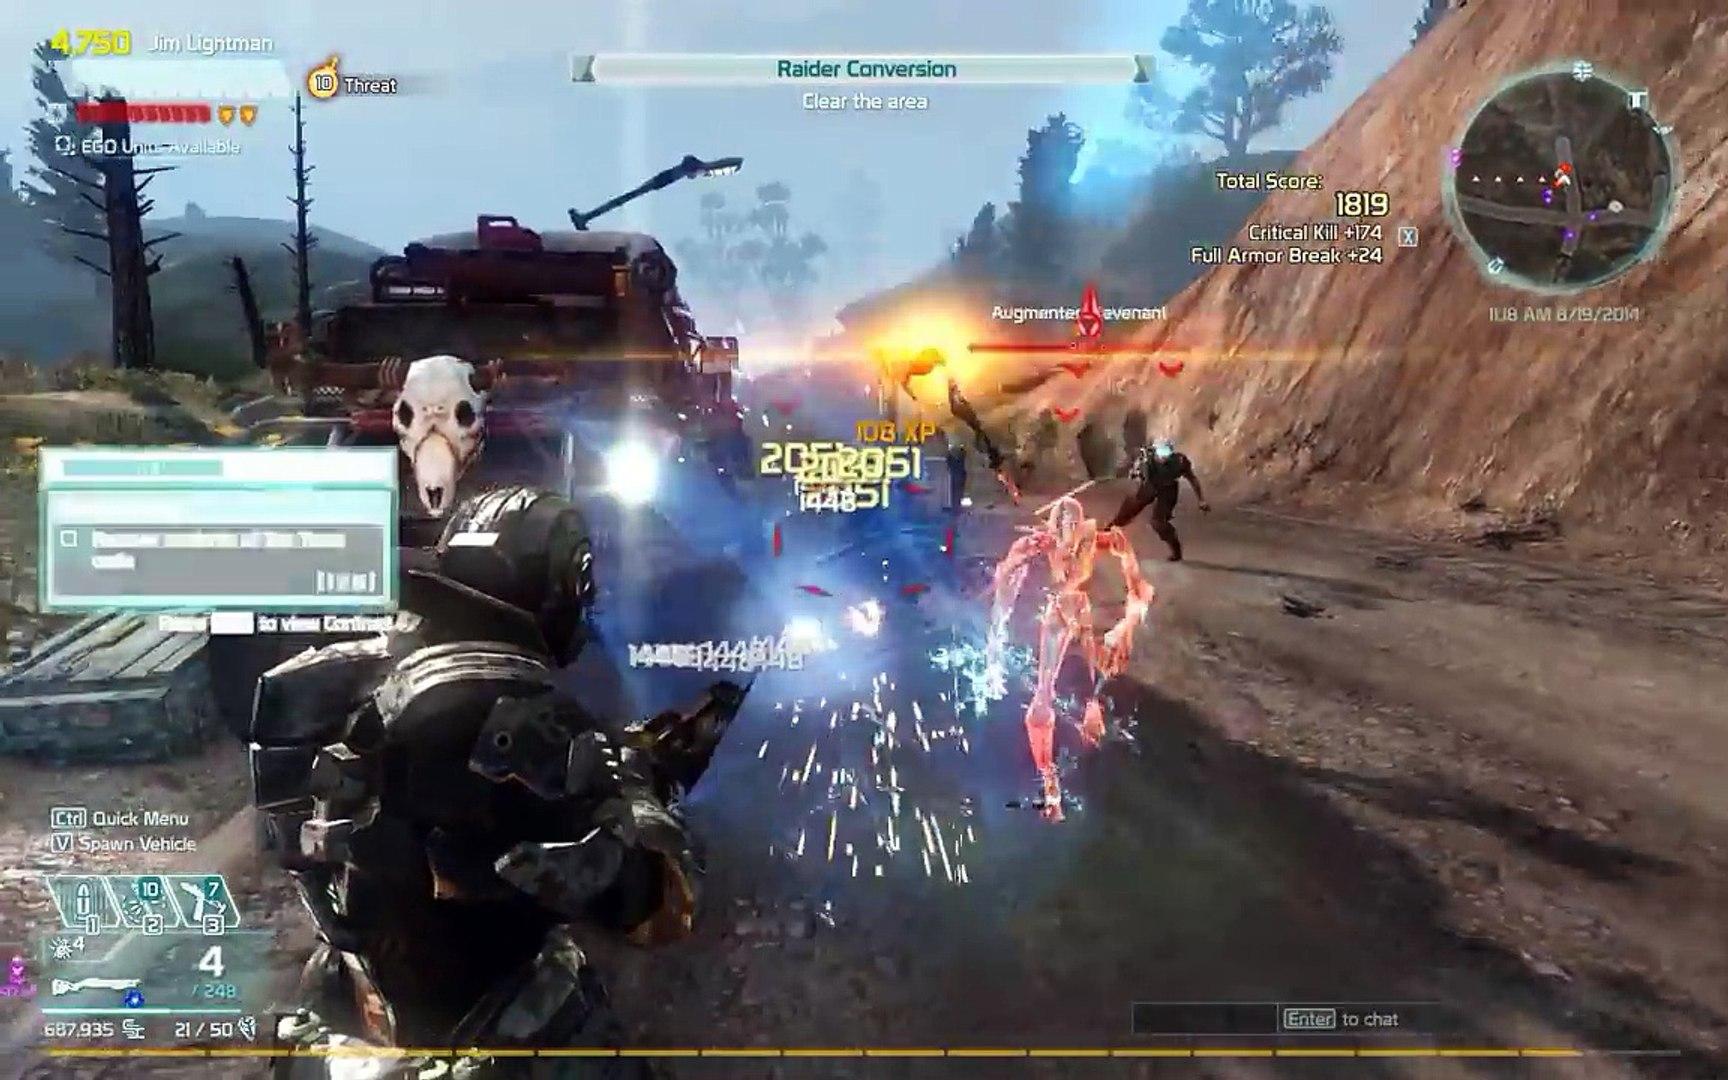 Defiance gameplay - Higher level gameplay